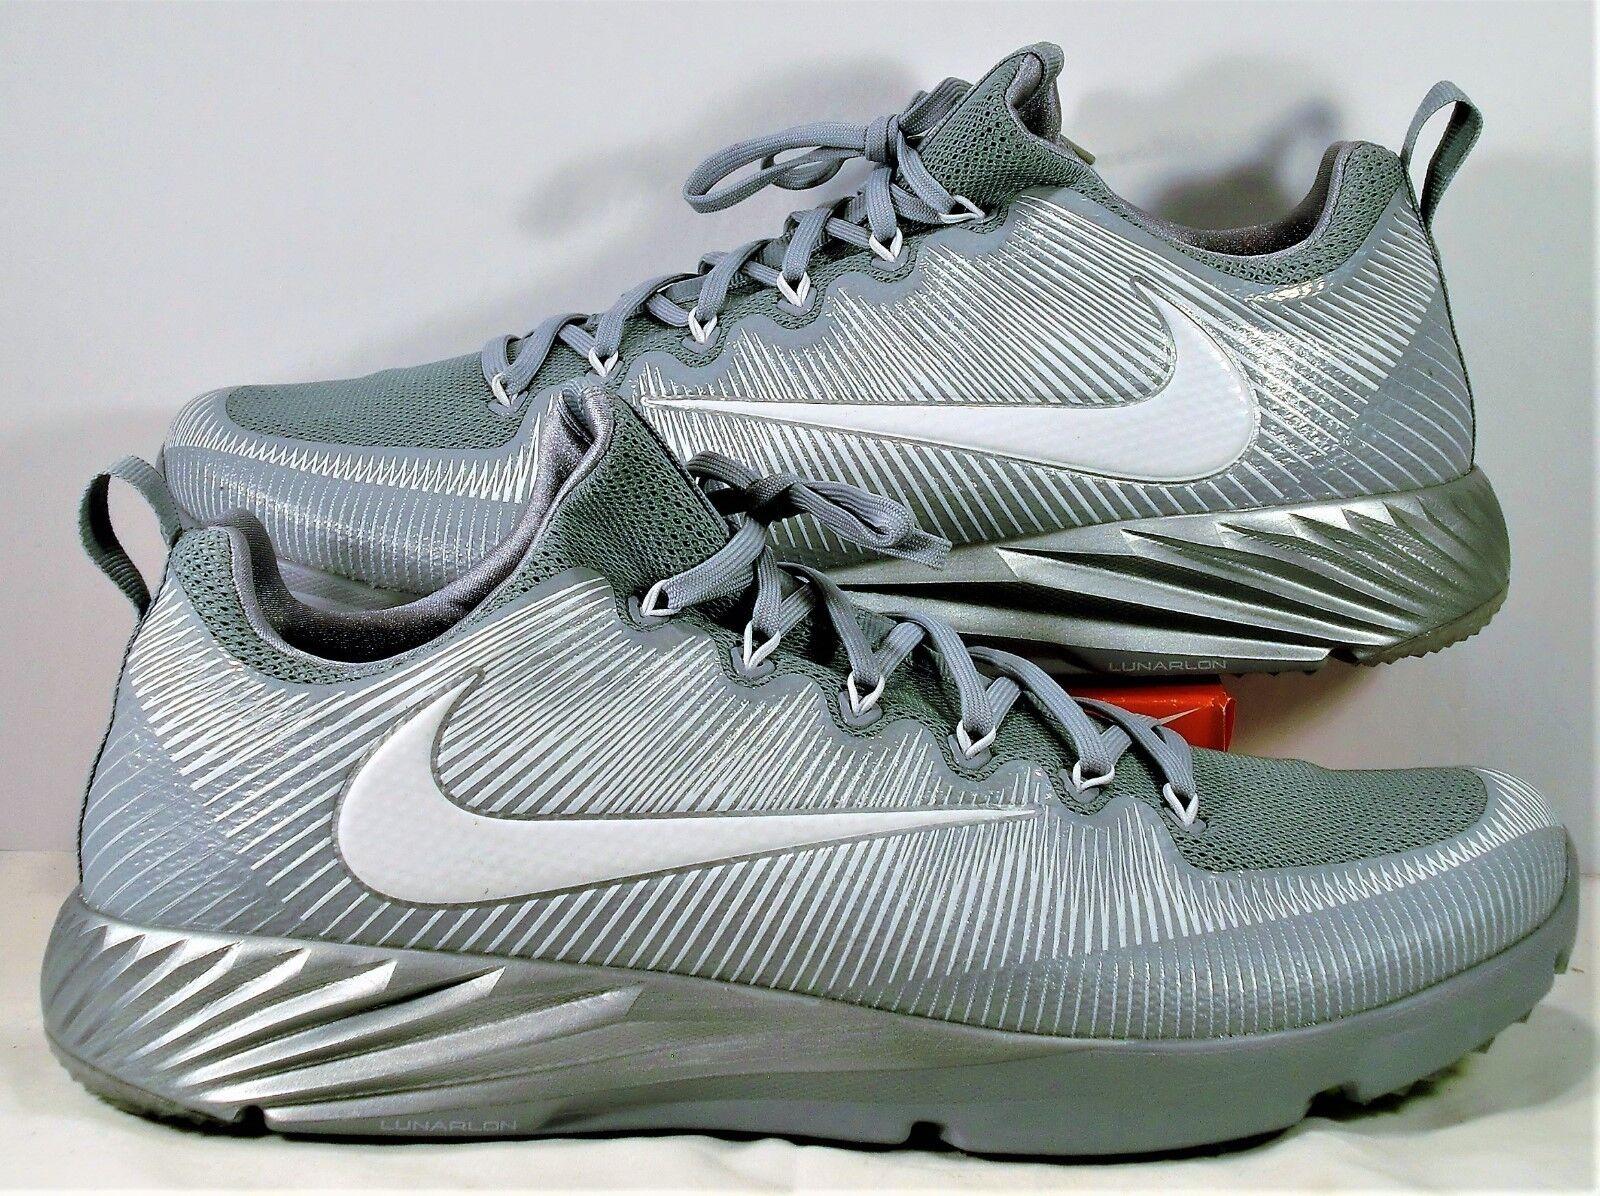 Nike Vapor Speed Turf LAX Wolf Grey 15 Football Trainer Shoes Sz 15 Grey NEW 833408 011 207306